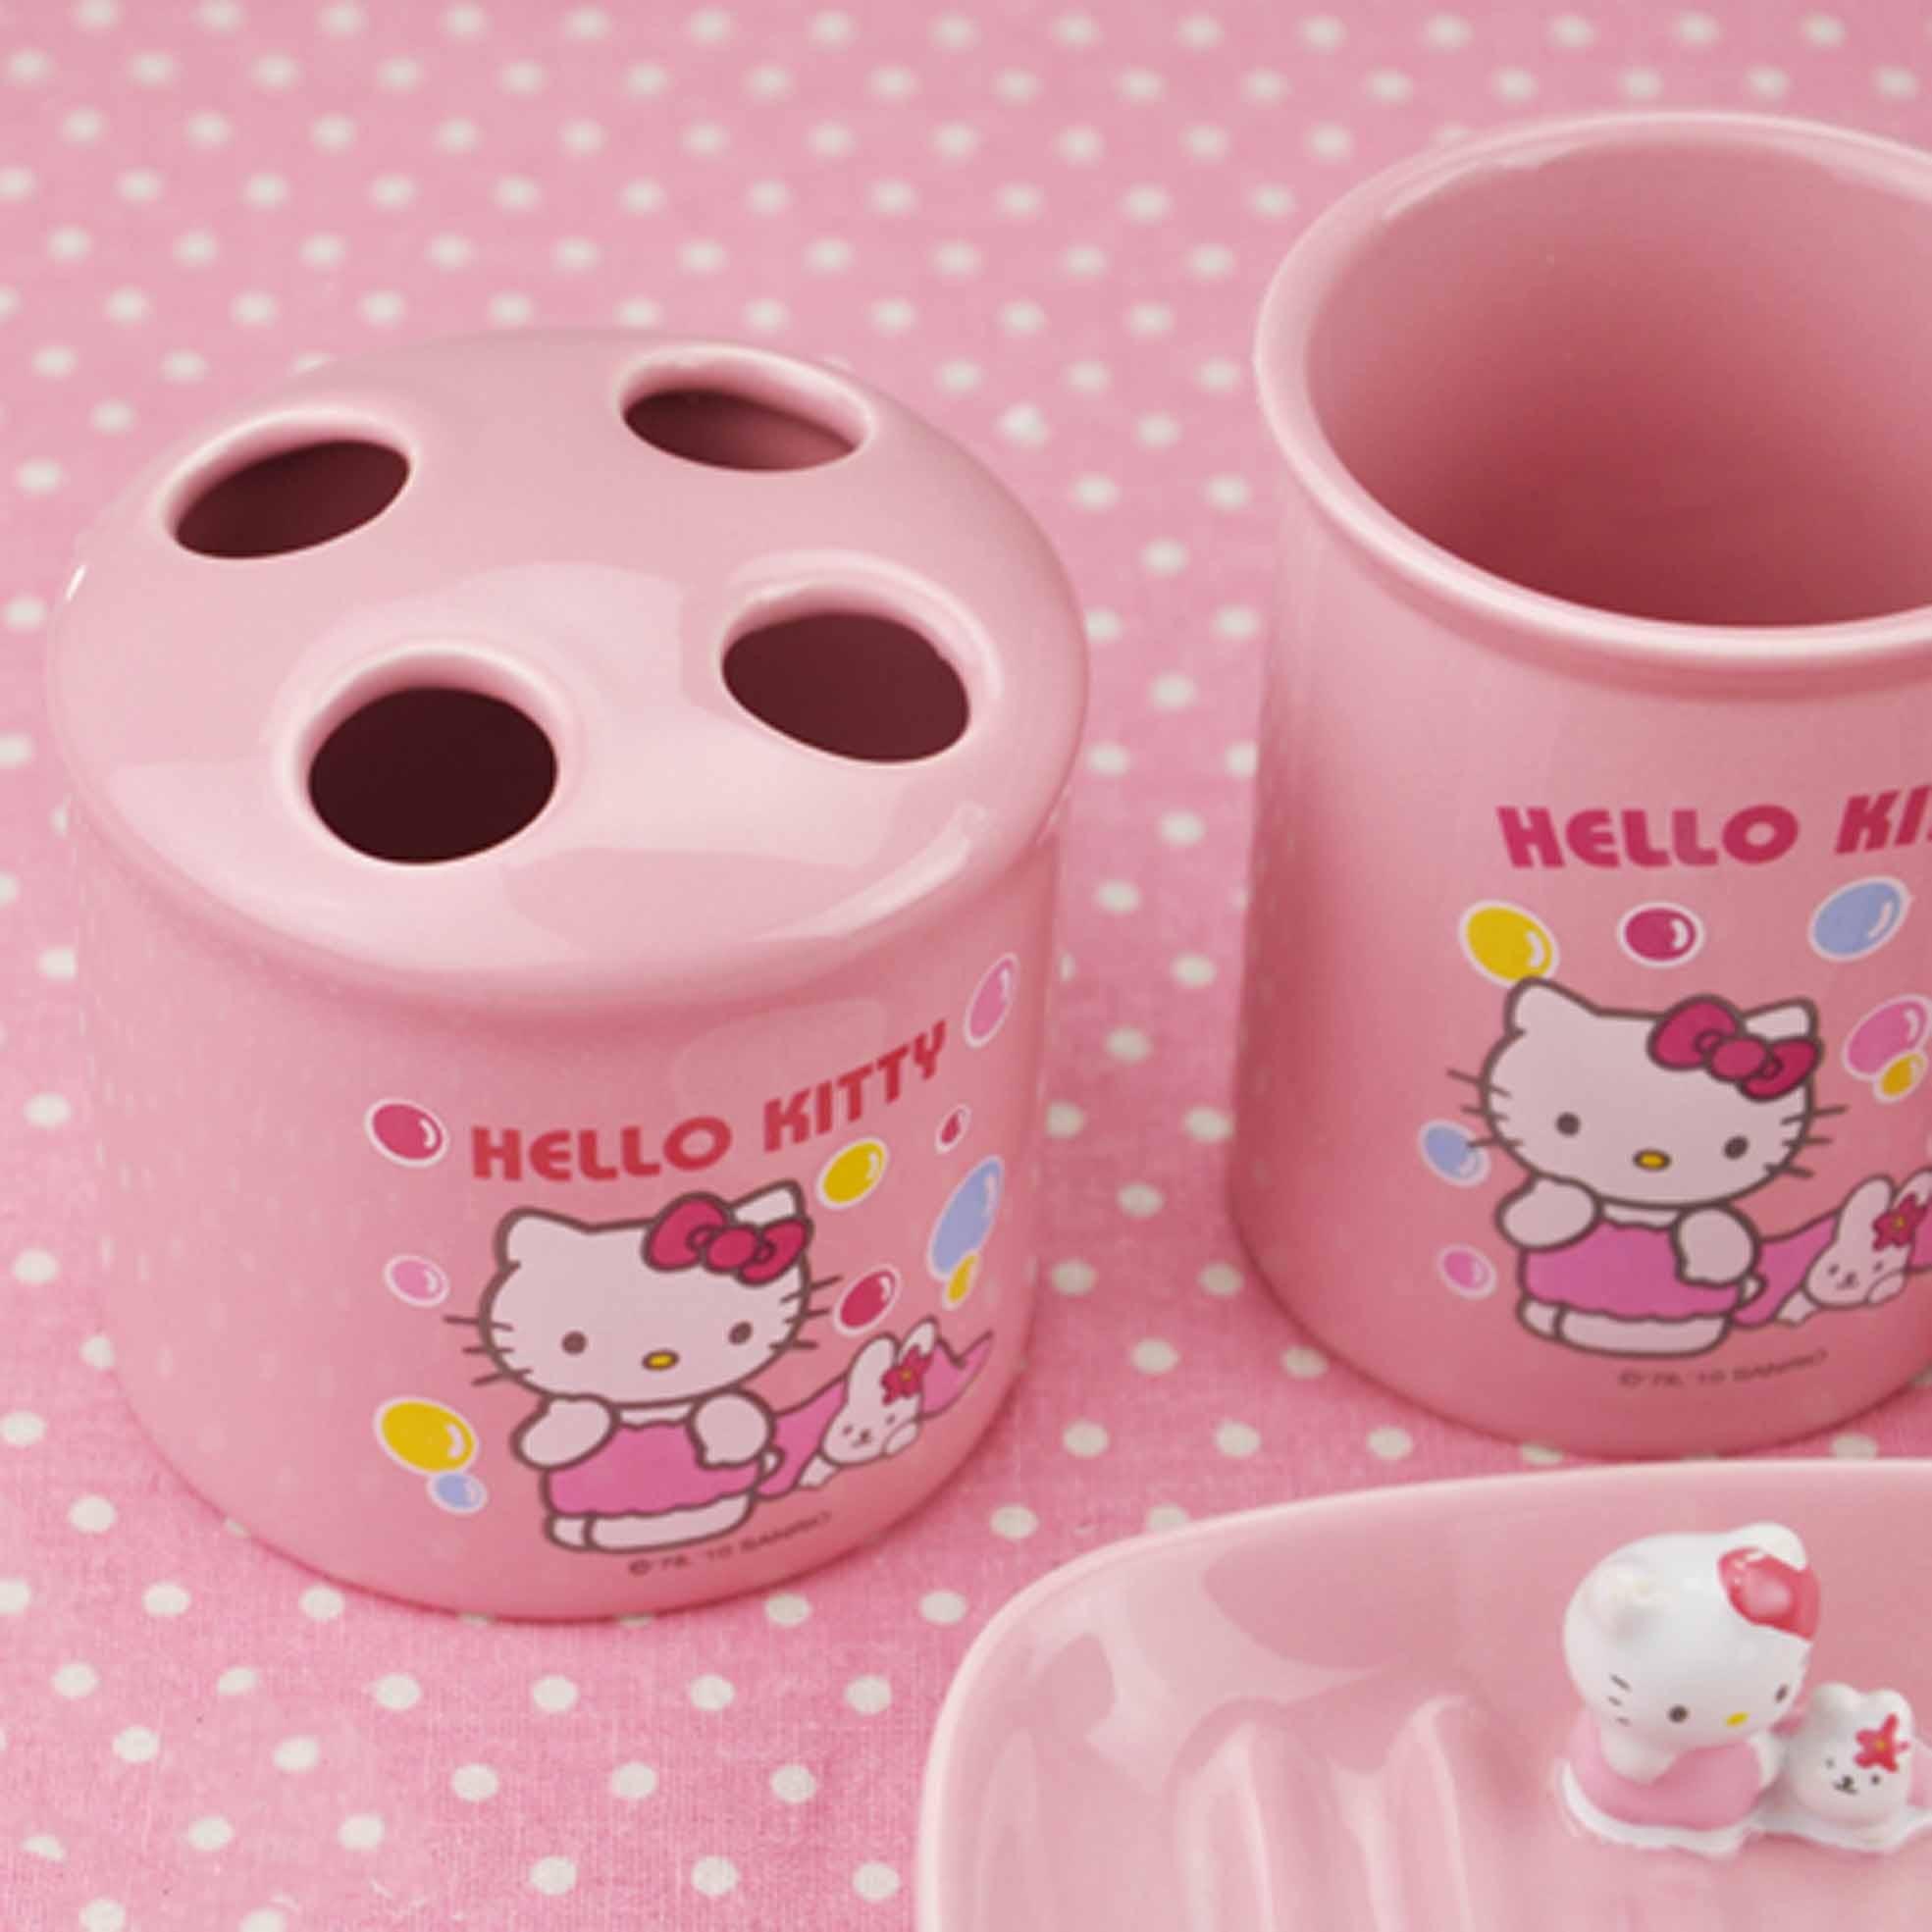 Hello Kitty Bathrooms My Hello Kitty Bathroom Wow It Looks